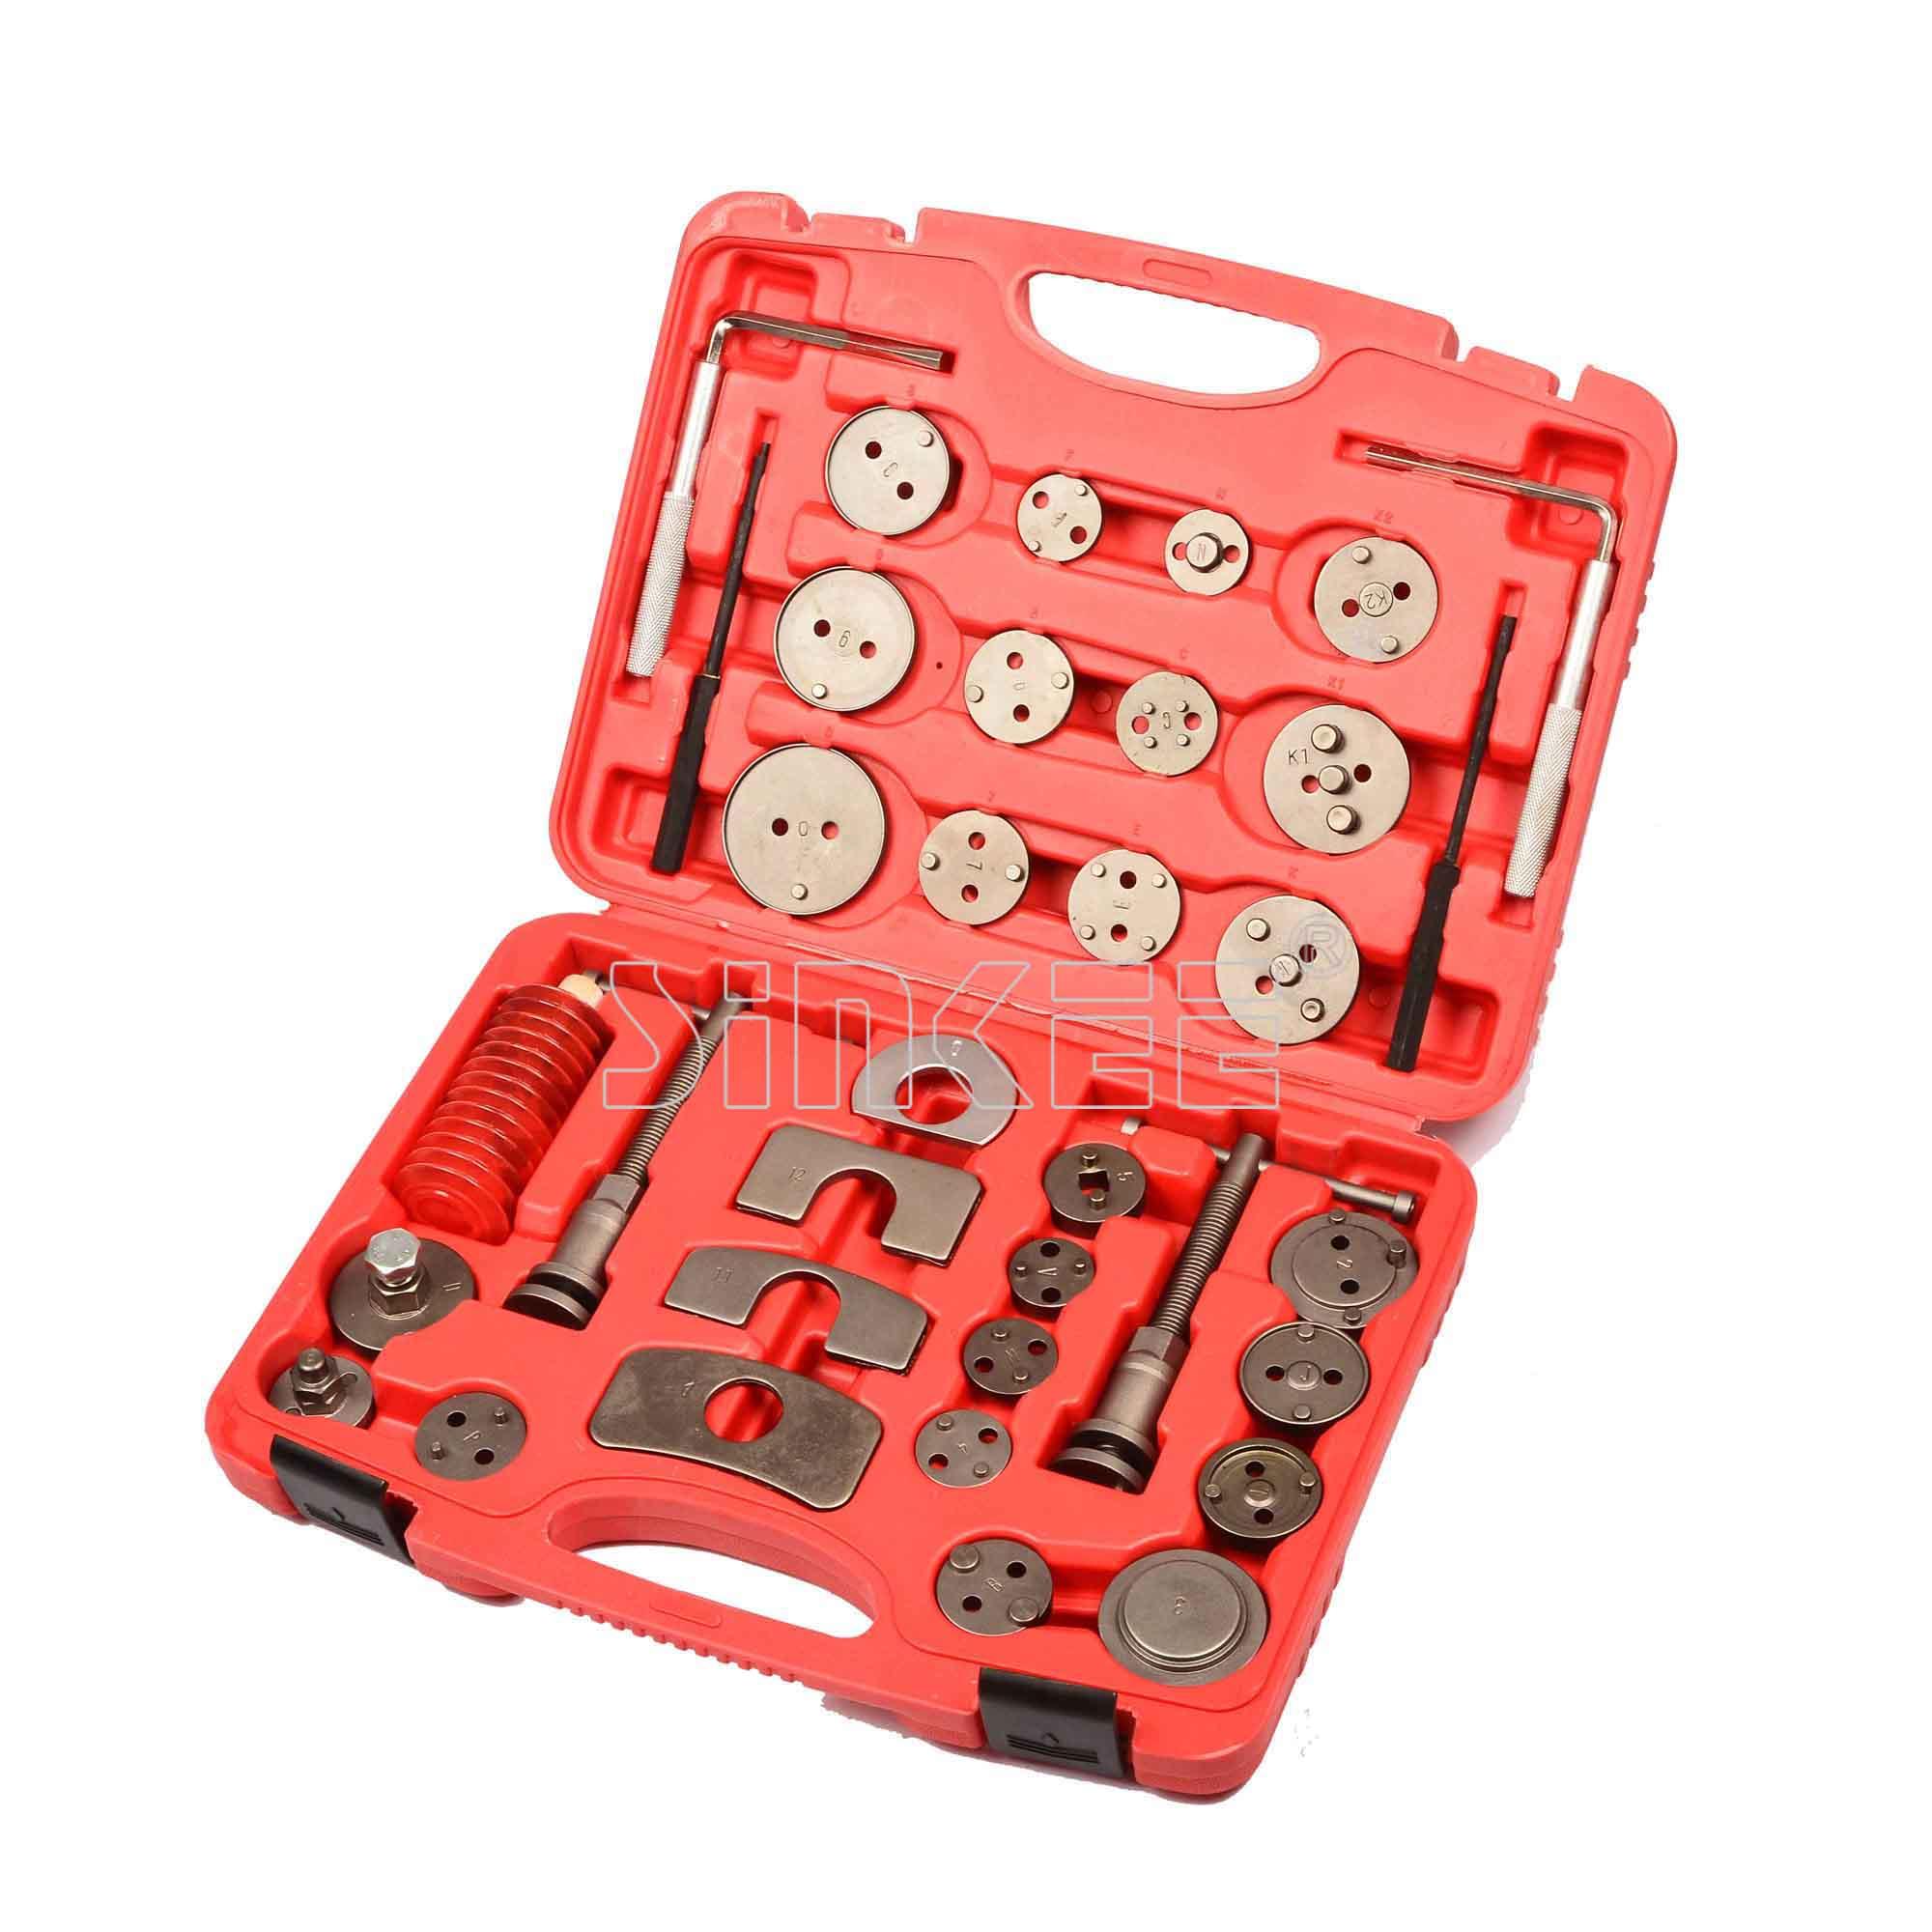 35pcs Universal Disc Brake Wind Back Pad Caliper Piston Compressor Tool Kit Set kitmmm5910121296unv20630 value kit highland transparent tape mmm5910121296 and universal perforated edge writing pad unv20630